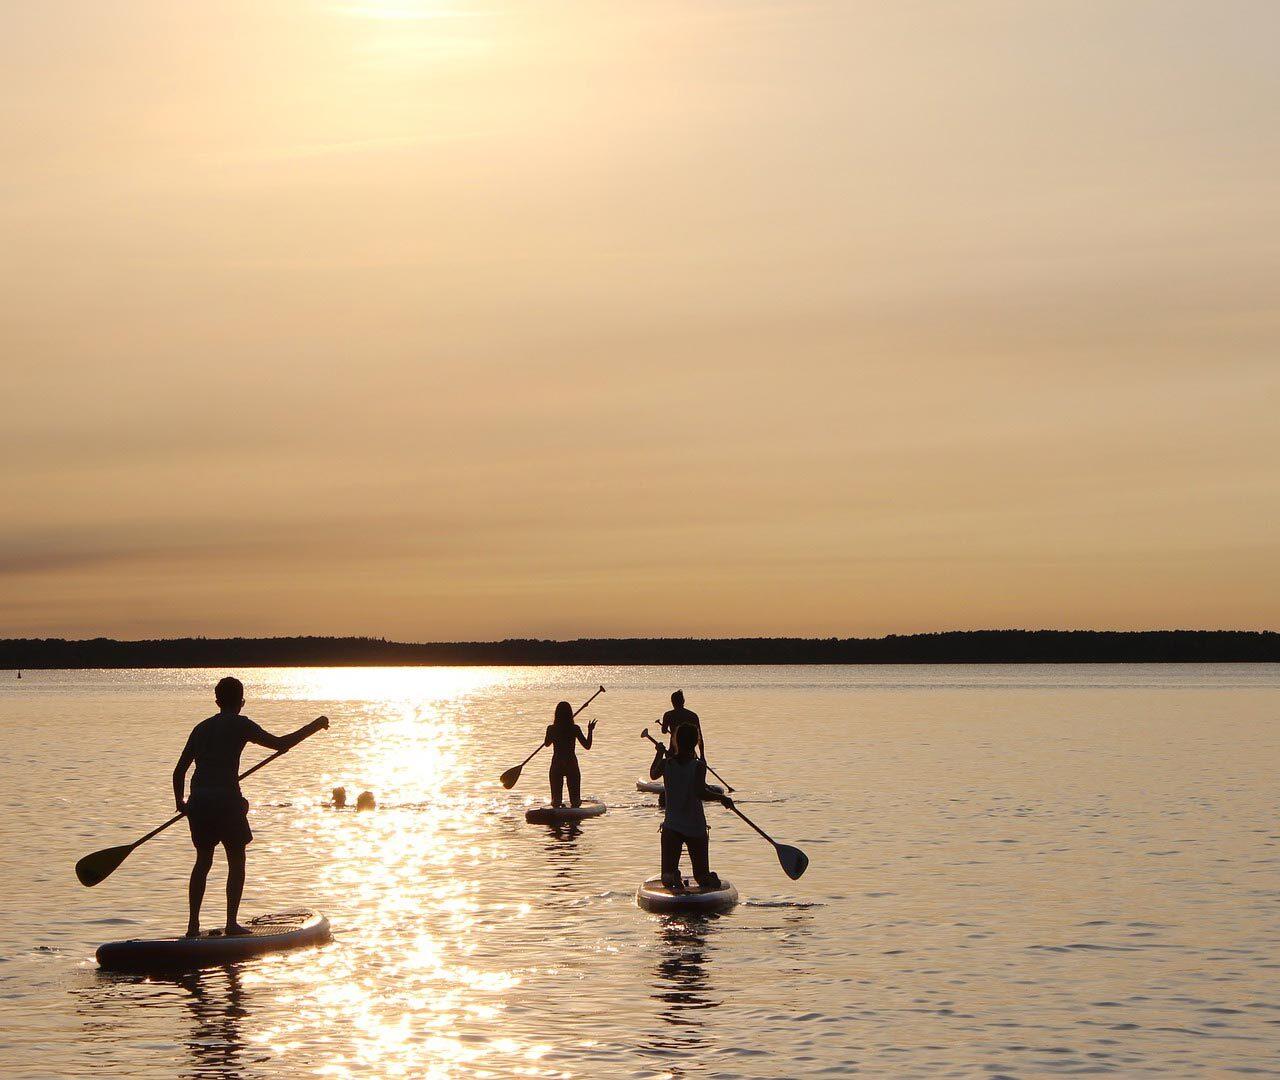 stand-up-paddle-noleggio-sup-monopoli-seaward